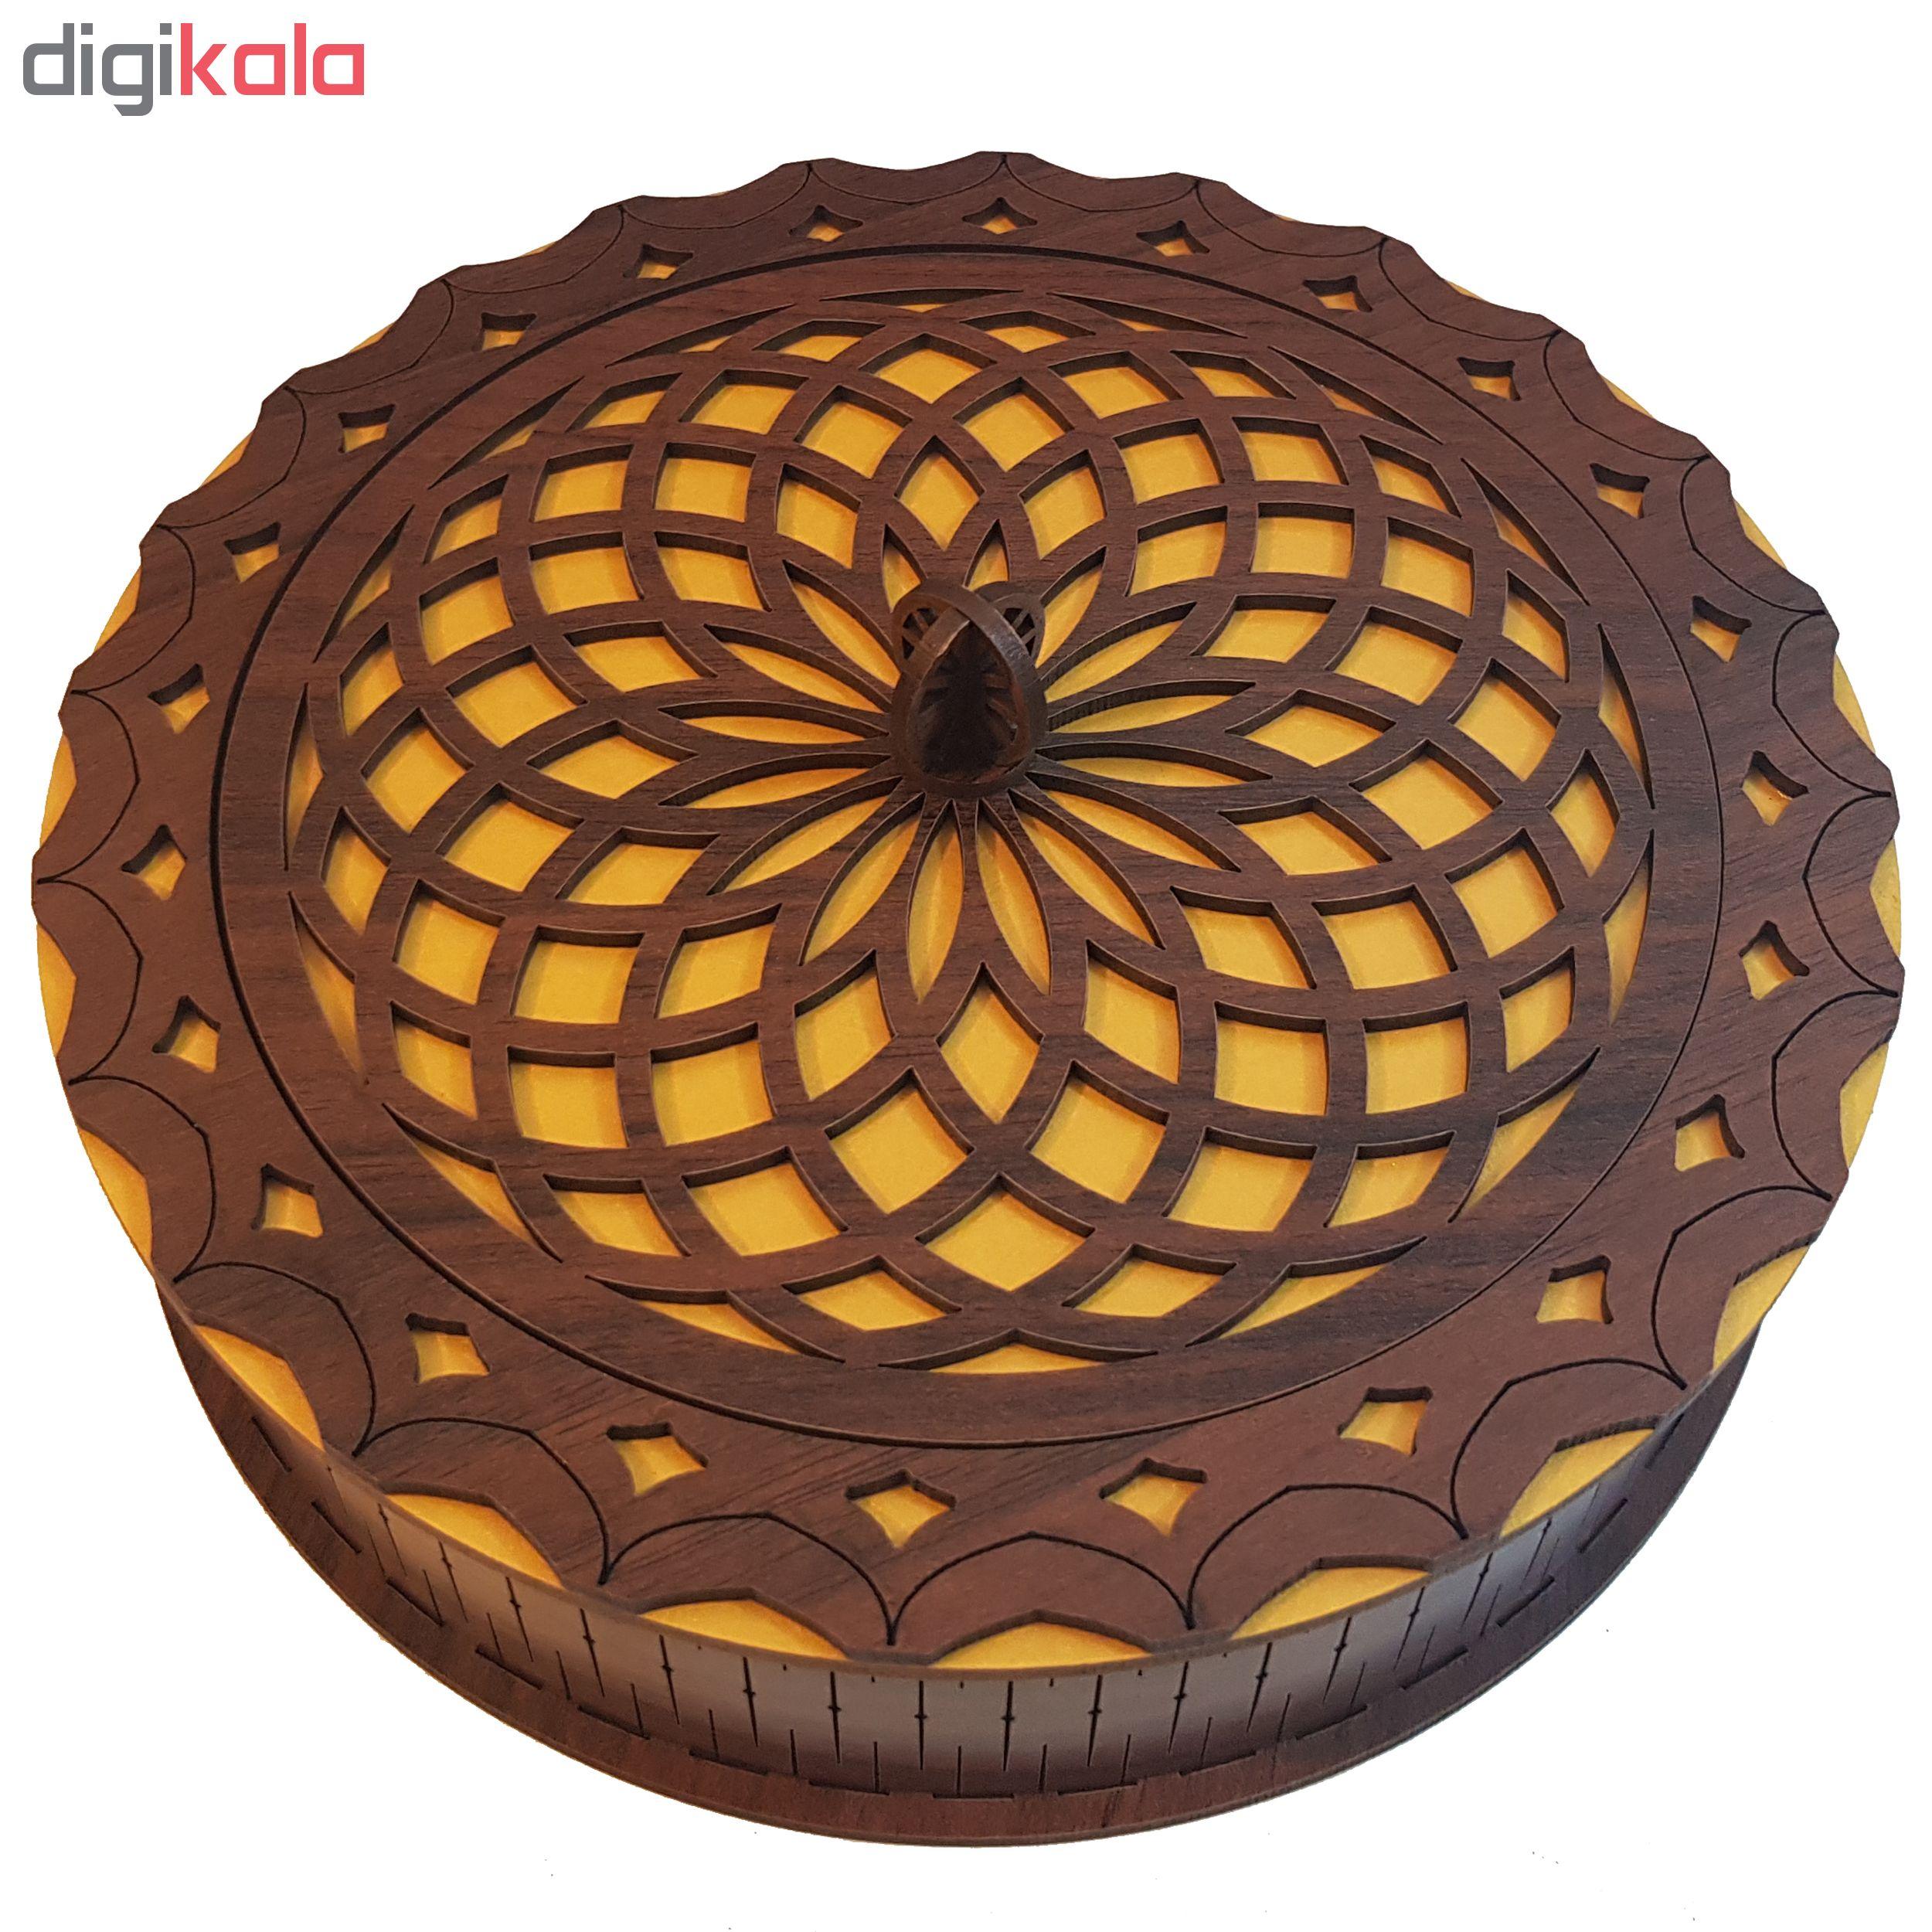 شکلات خوری مدل ماندالا کد mg20